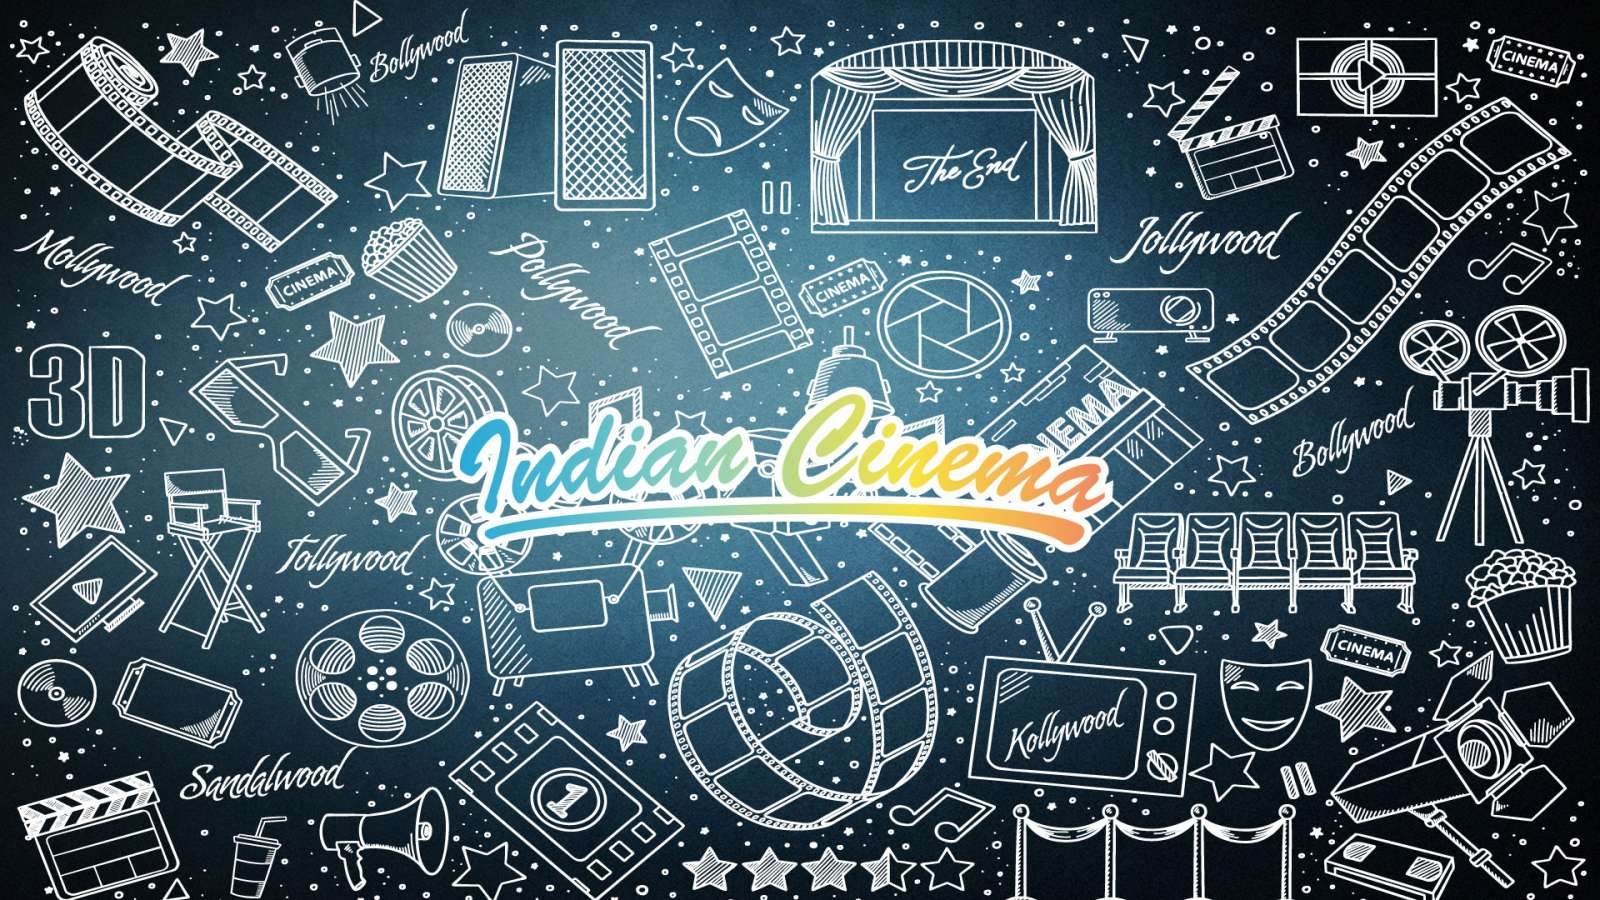 Indian Cinema Alpha Pictures